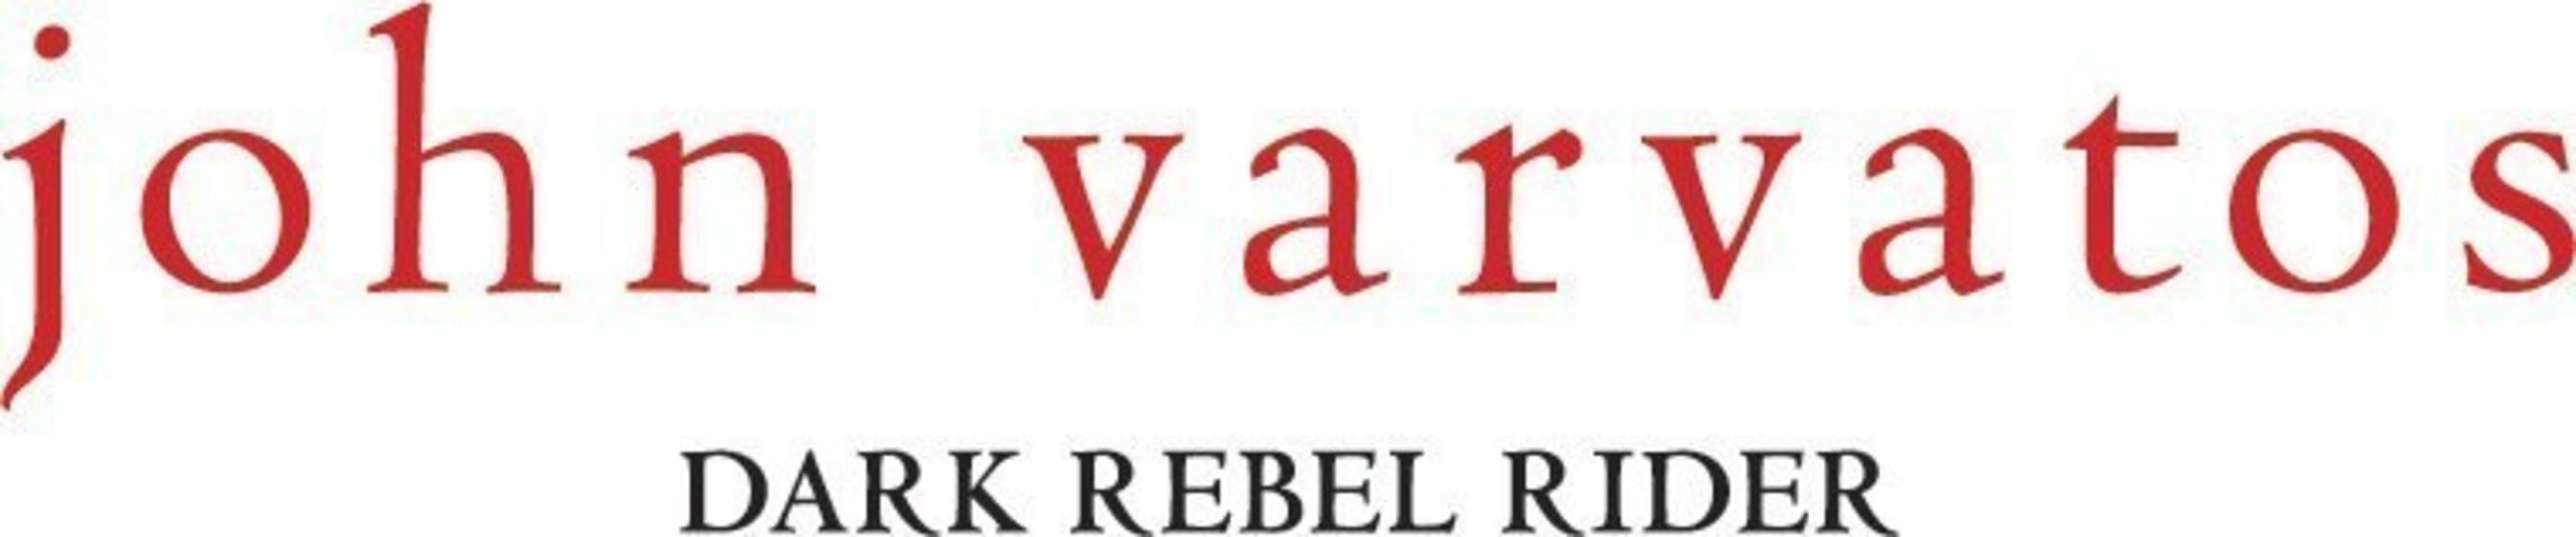 John Varvatos Dark Rebel Rider #DarkRebel